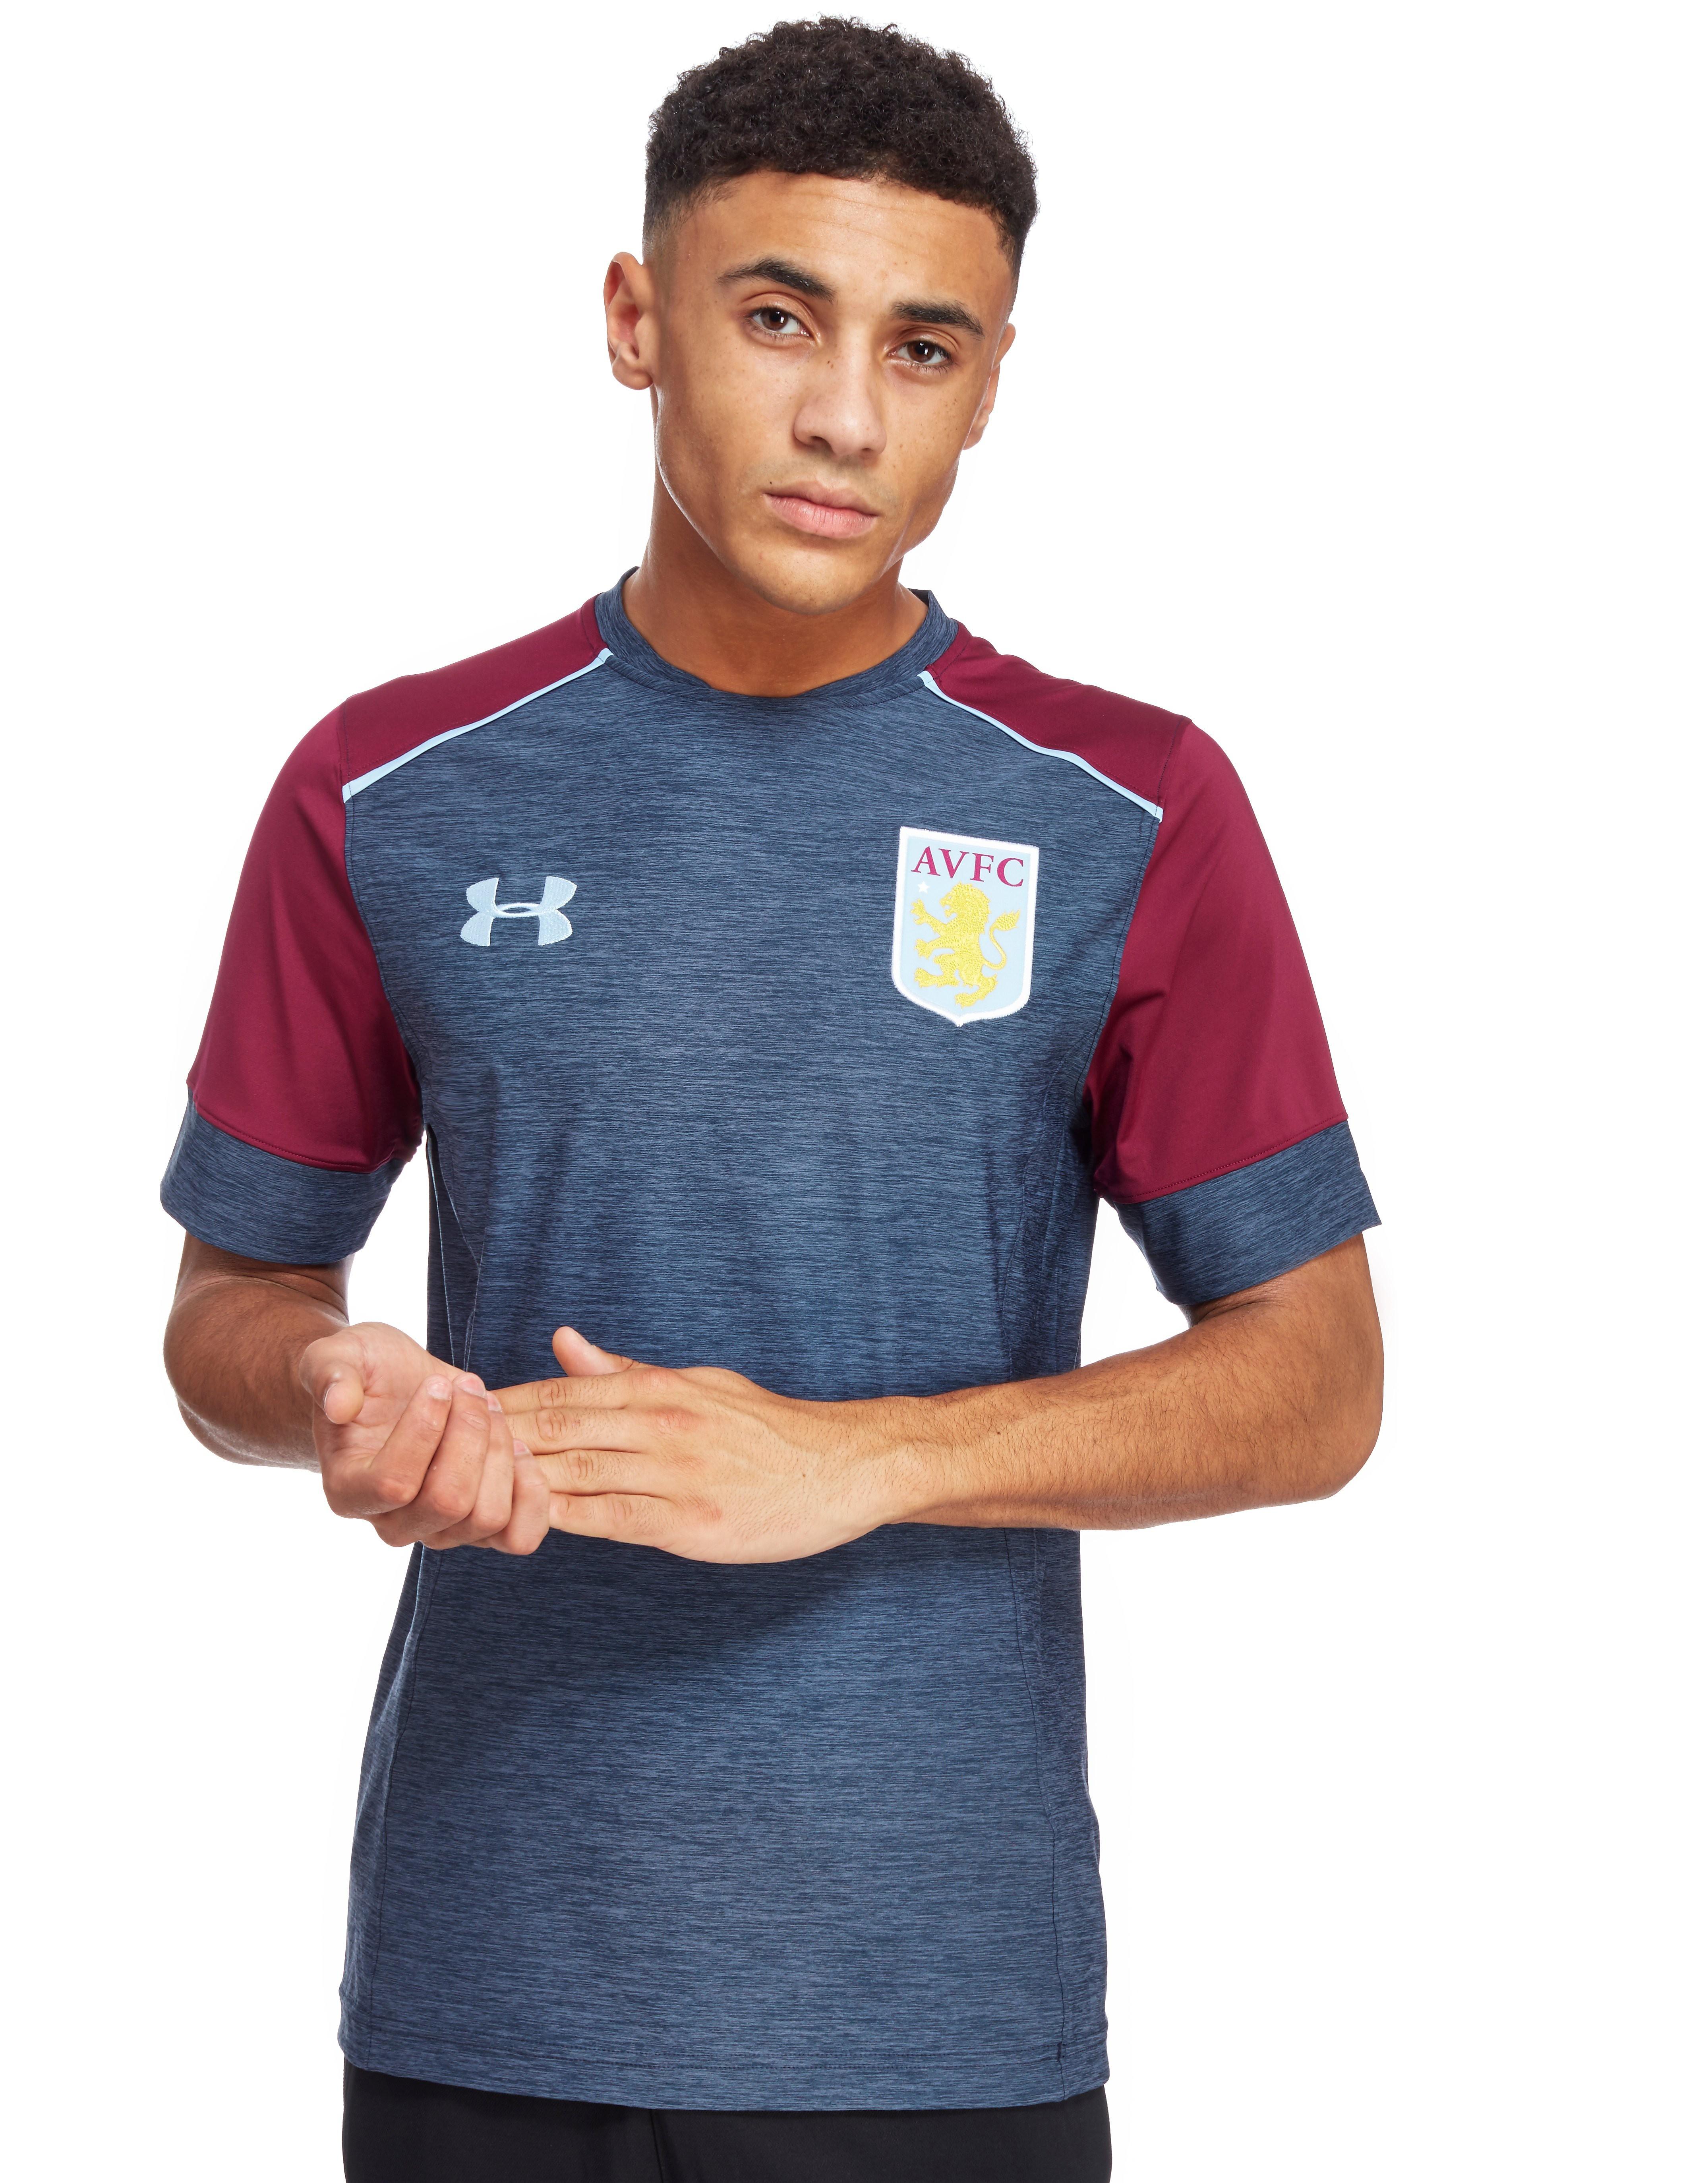 Under Armour Aston Villa FC 2016/17 Training Shirt